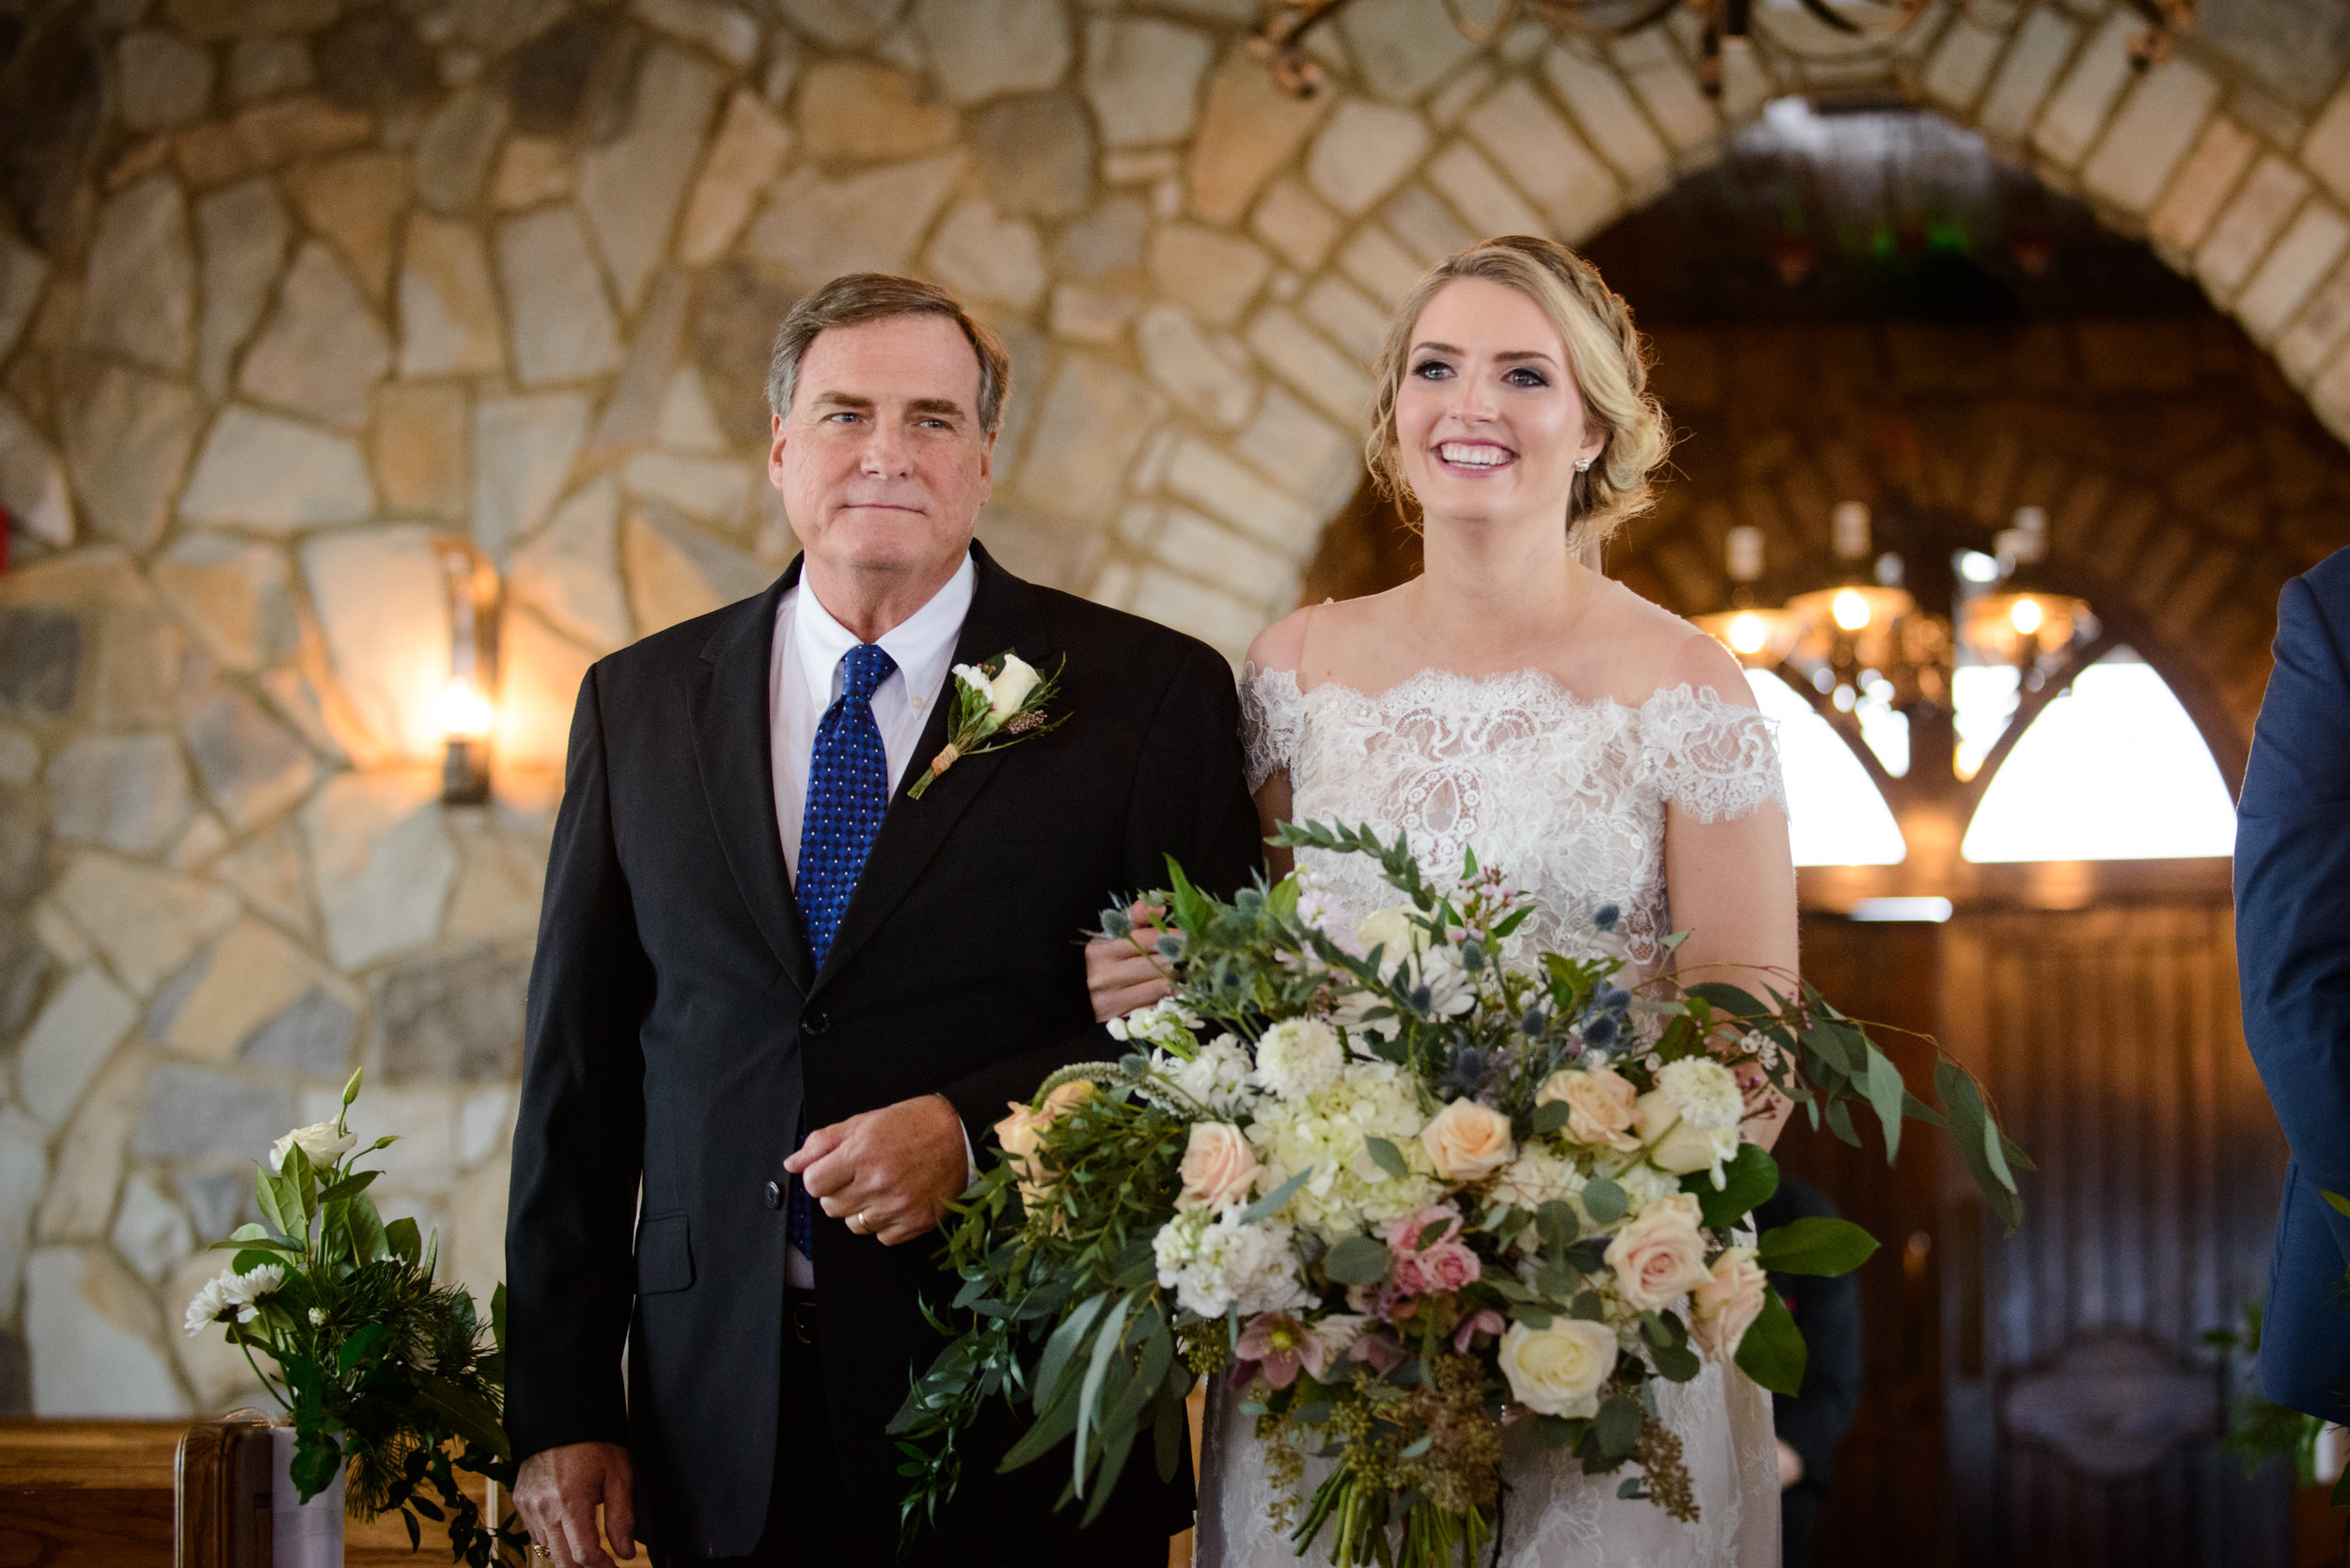 sefick-cliffs-glassy-chapel-wedding-26.jpg